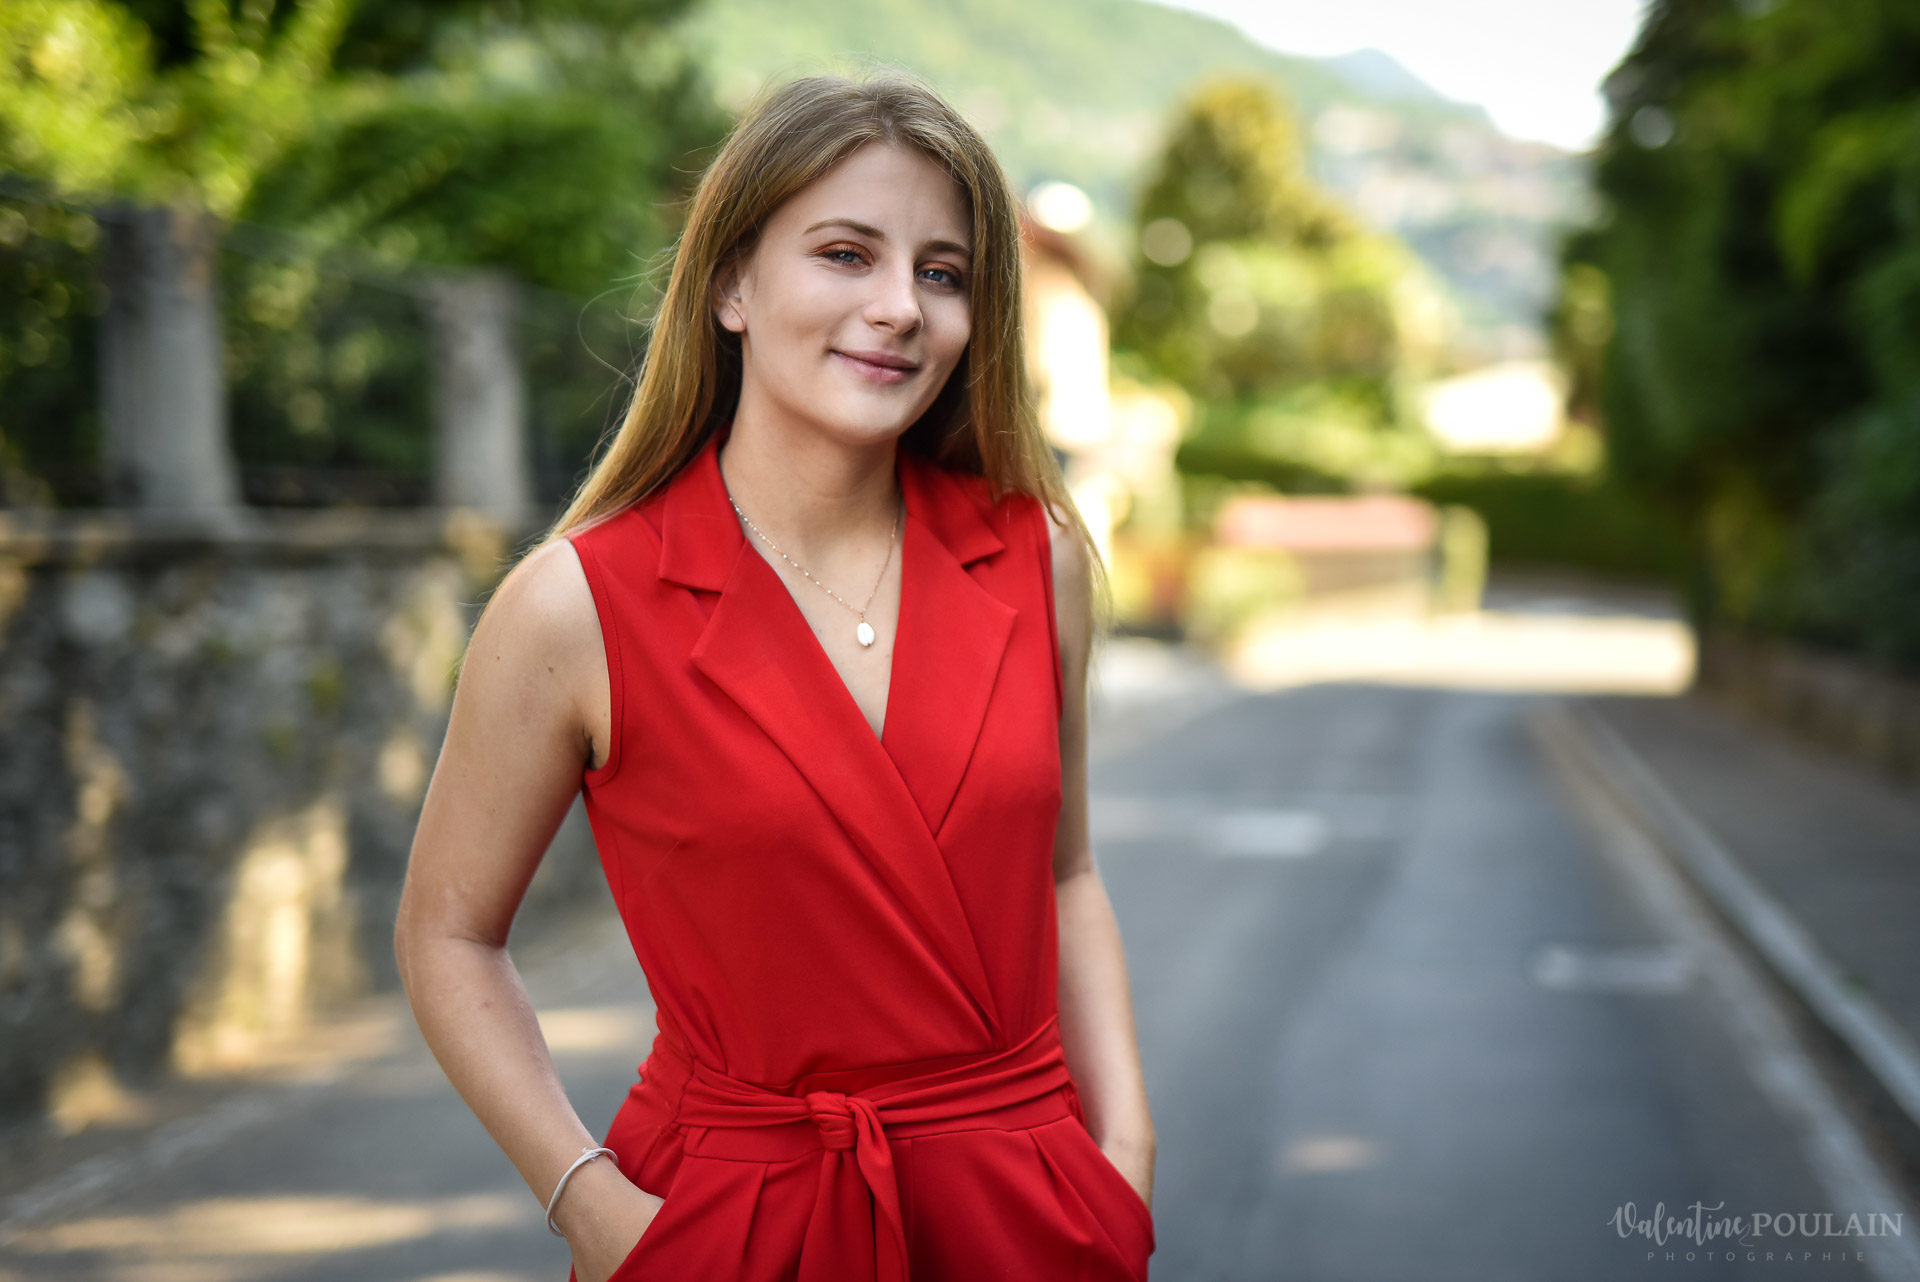 Shooting soeurs Italie - Valentine Poulain Aloyse